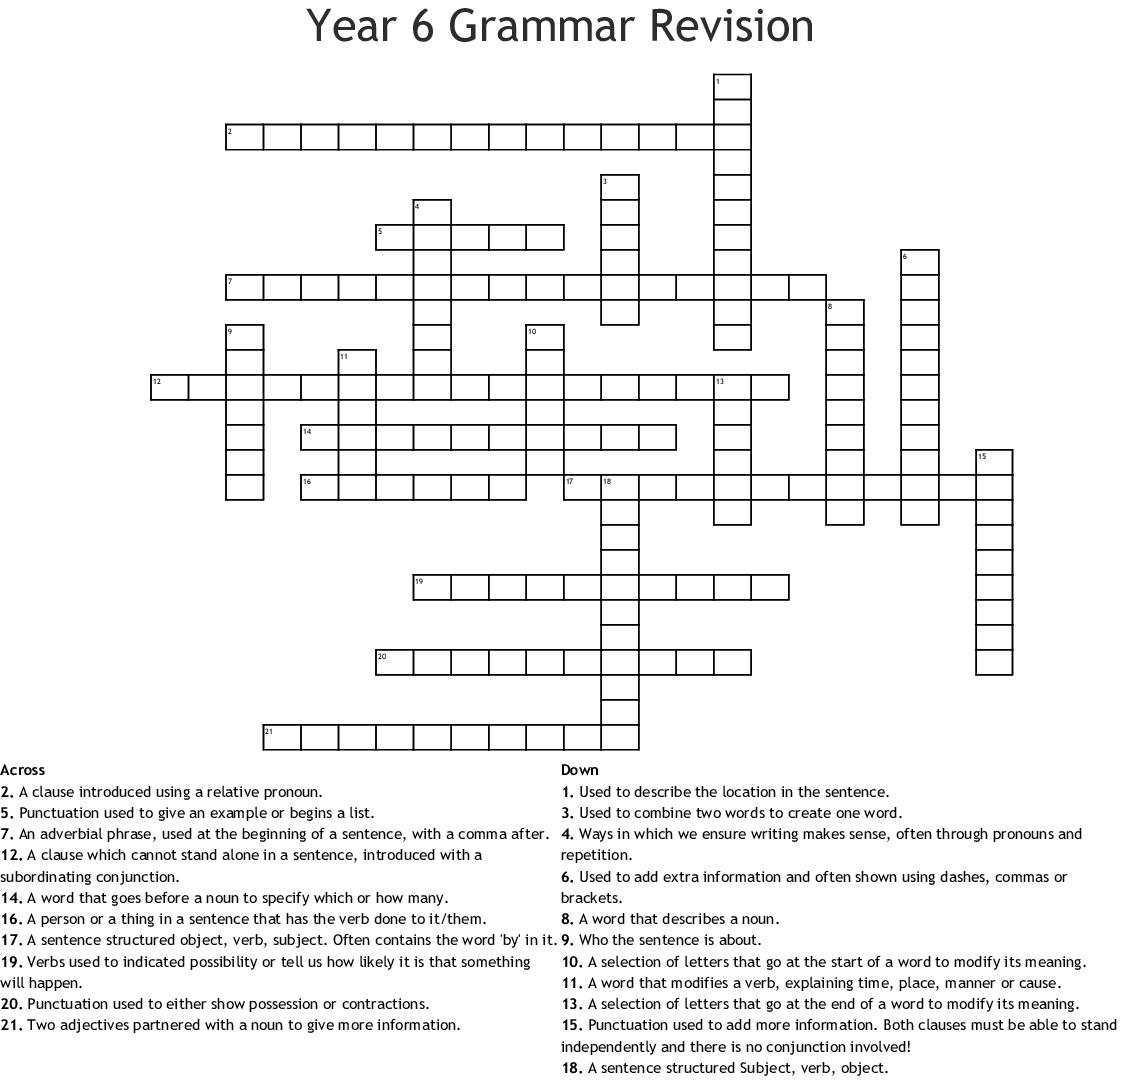 Year 6 Grammar Revision Crossword